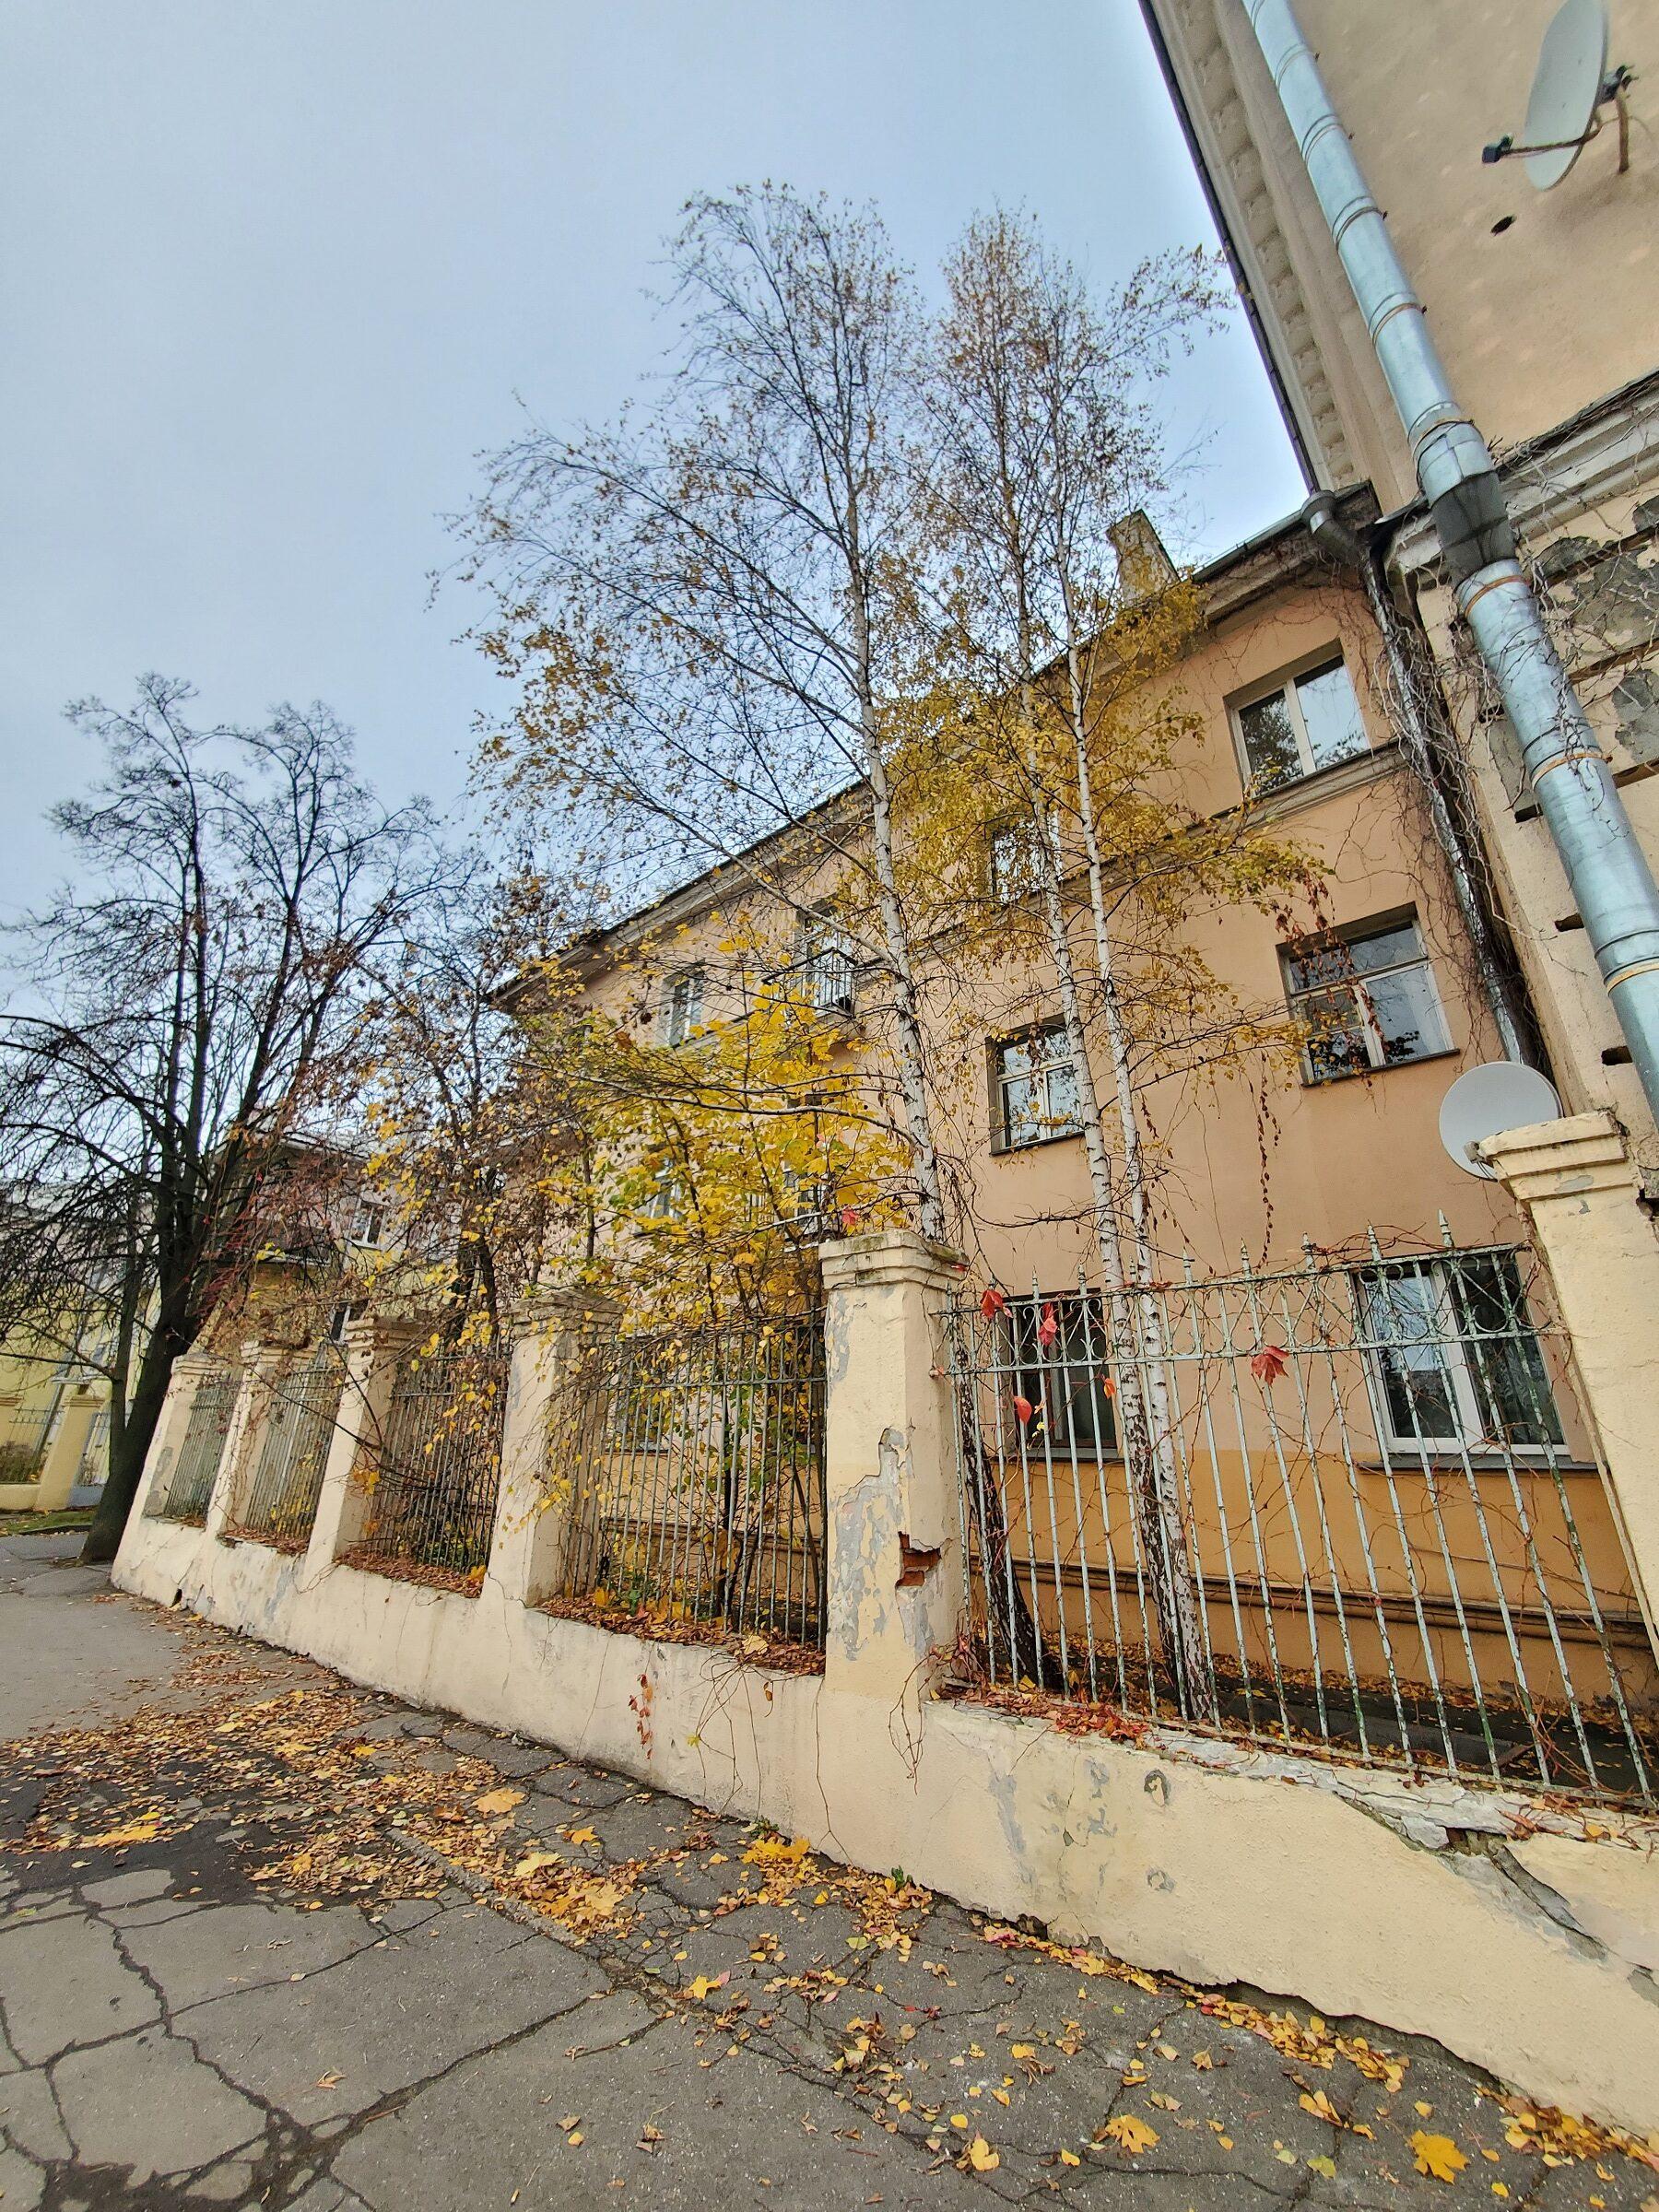 20201107 151337 rotated - Минск. Тракторозаводской поселок